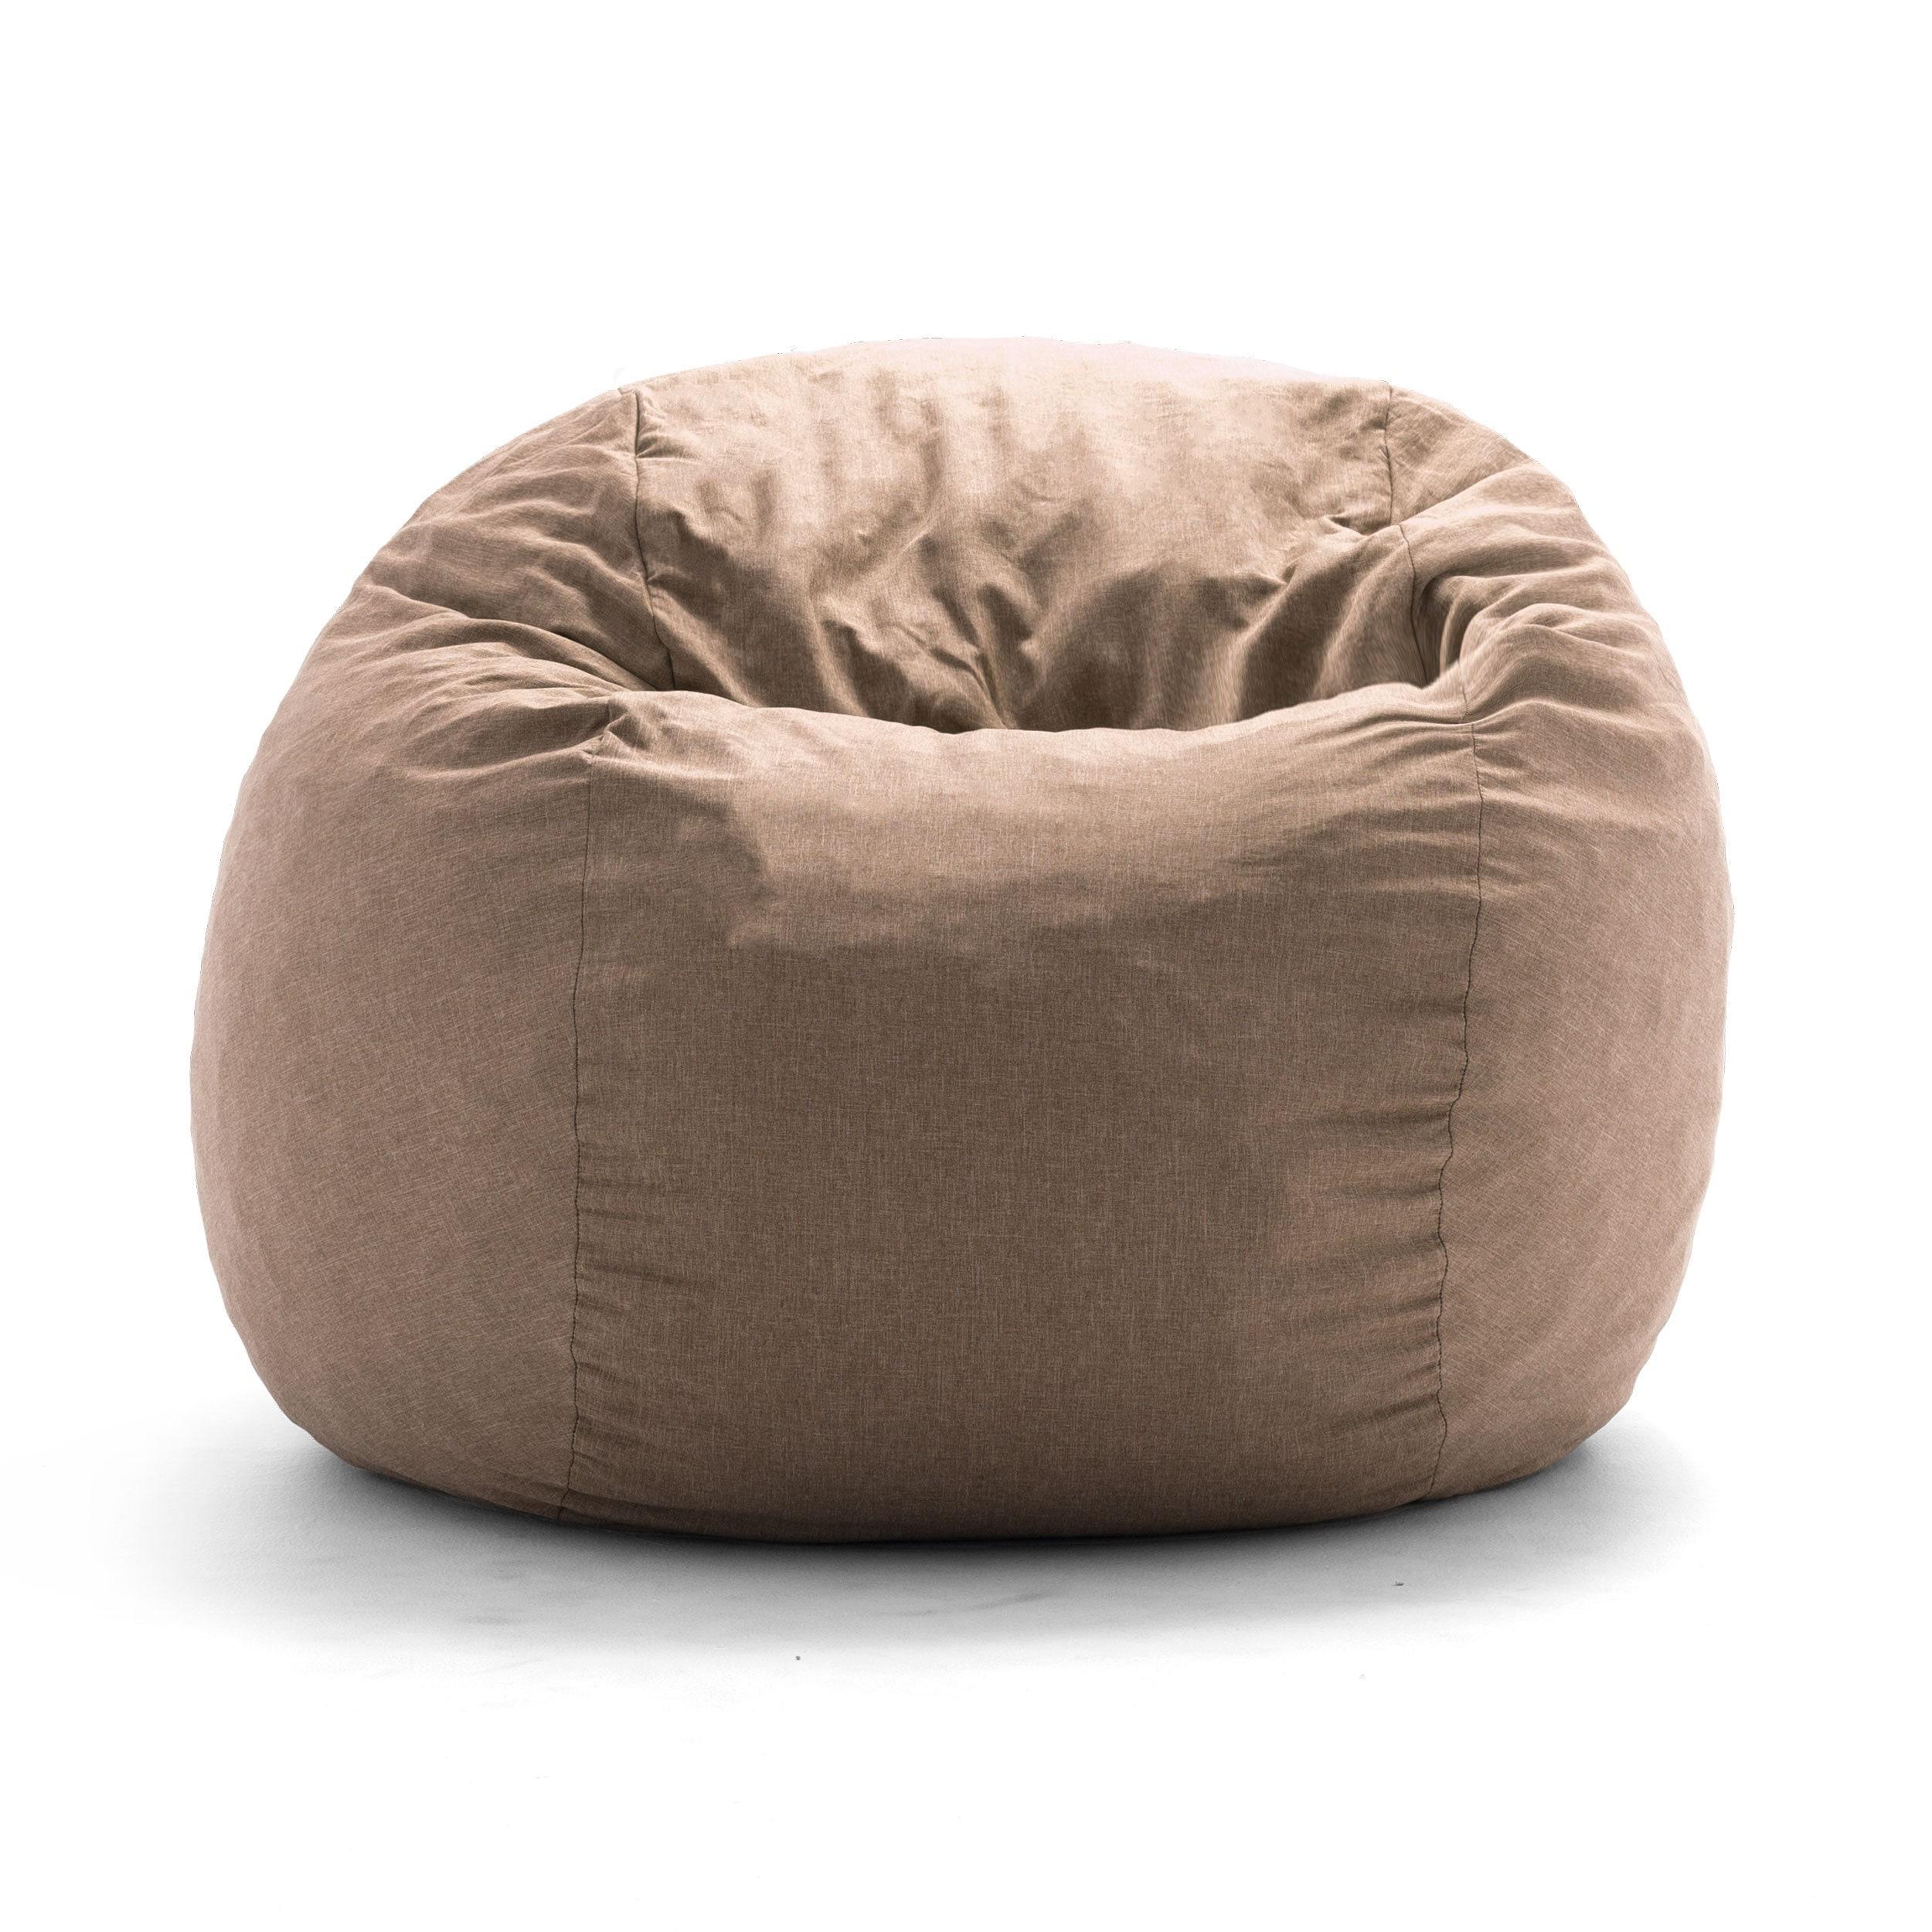 FufSack Big Joe Lux King Linen Memory Foam Bean Bag Chair...